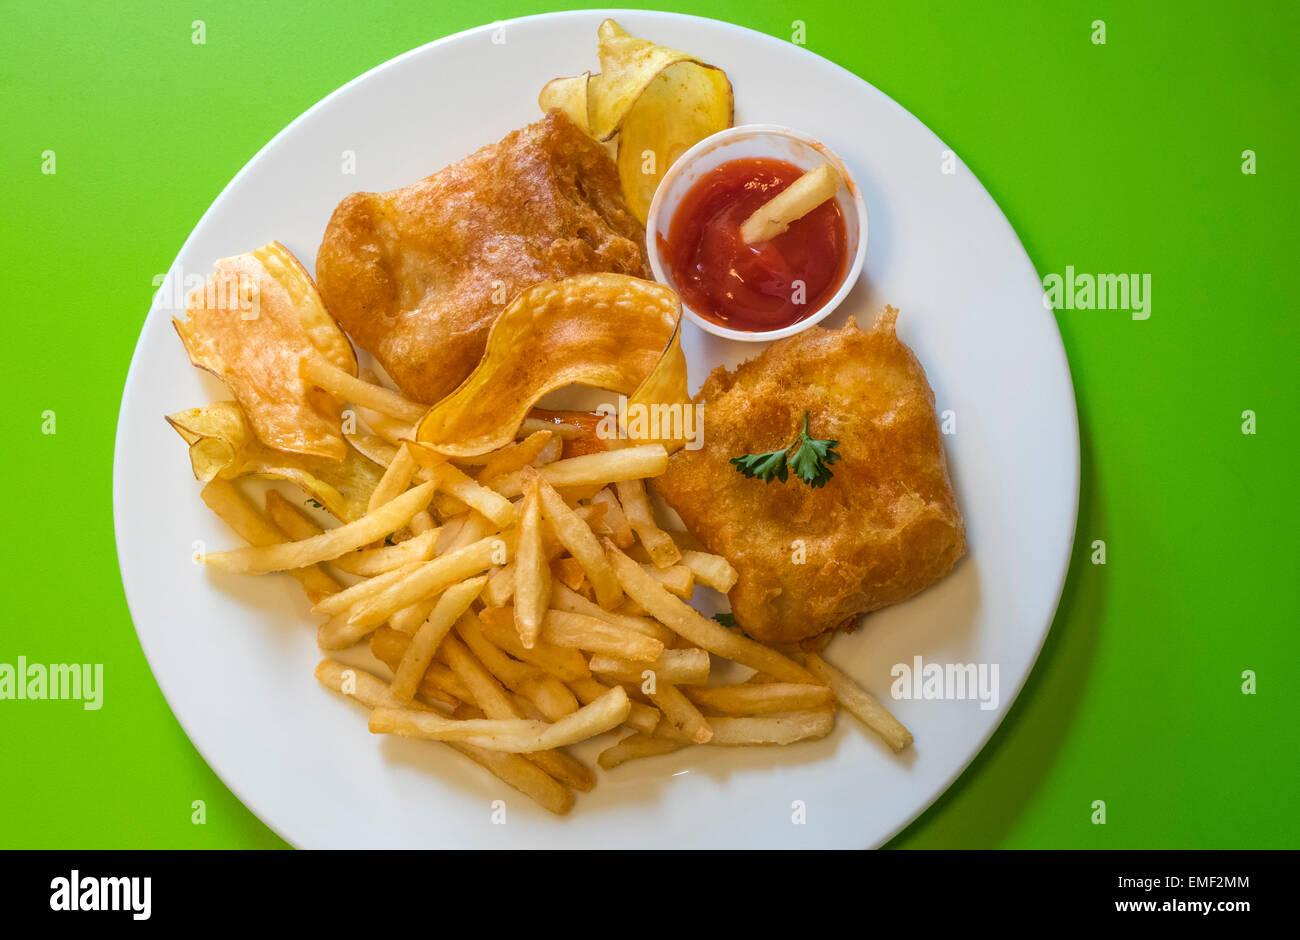 fish-and-chips-EMF2MM.jpg